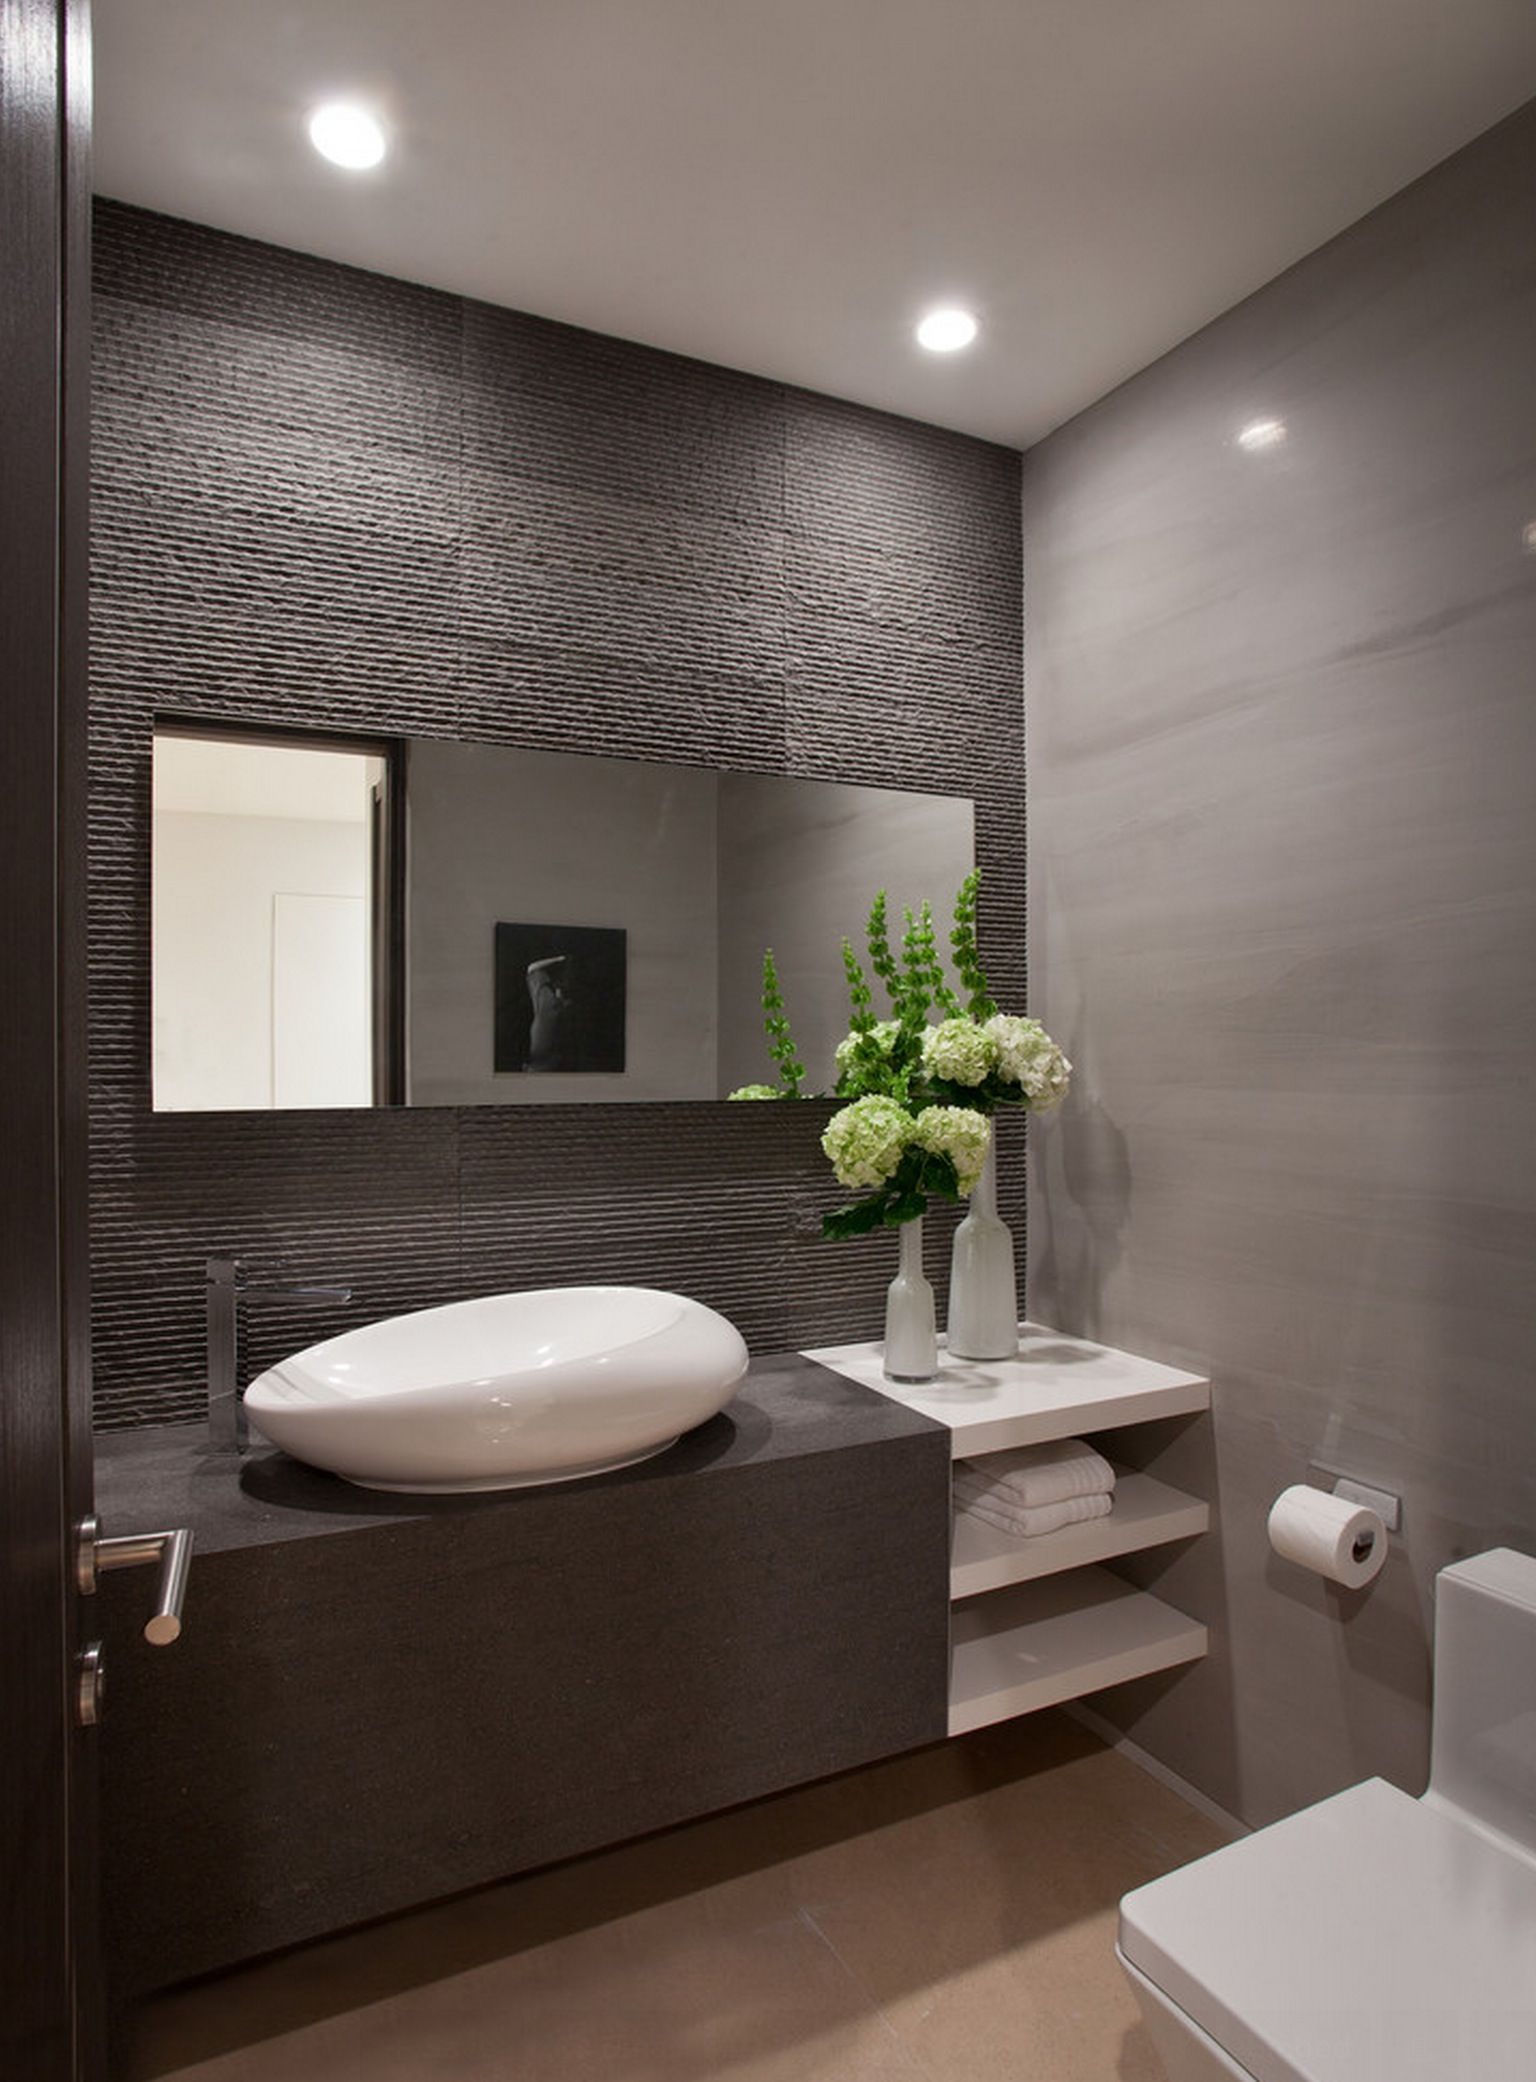 modern bathrooms designs 2014. Bathroom Design August 2014 63. Contemporary Modern Bathrooms Designs